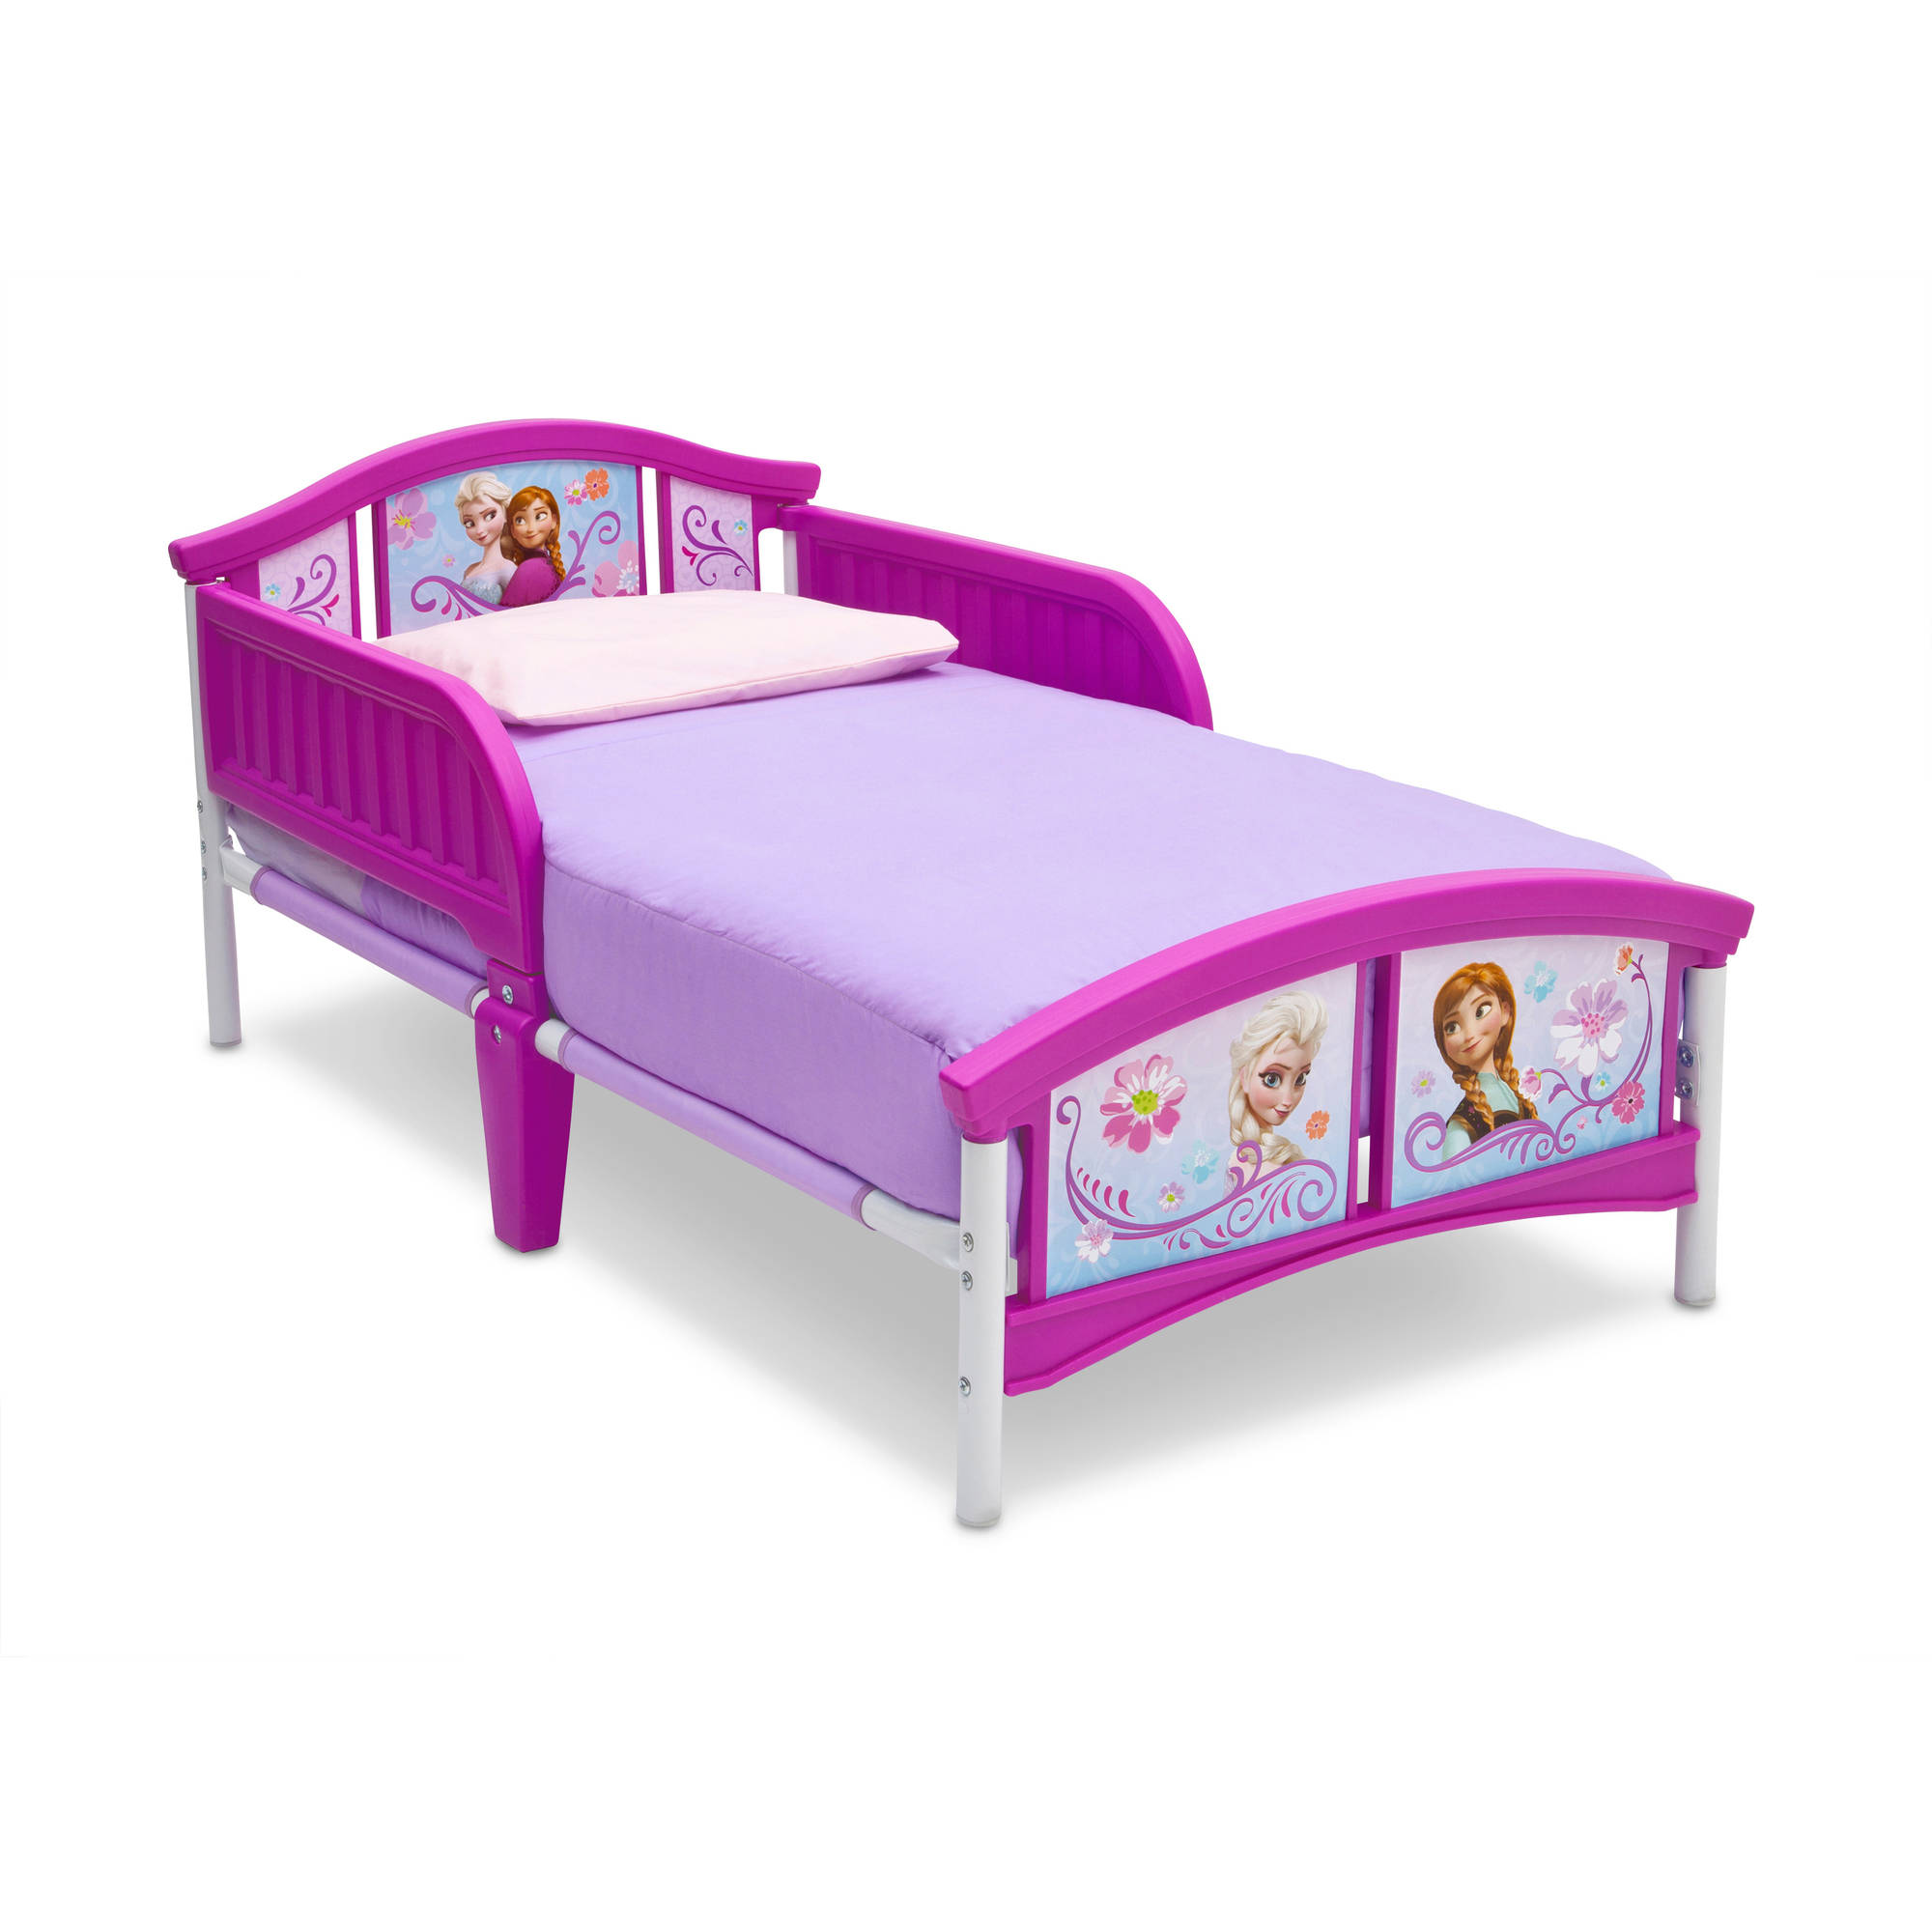 Delta Children's Products Disney Frozen Plastic Toddler Bed